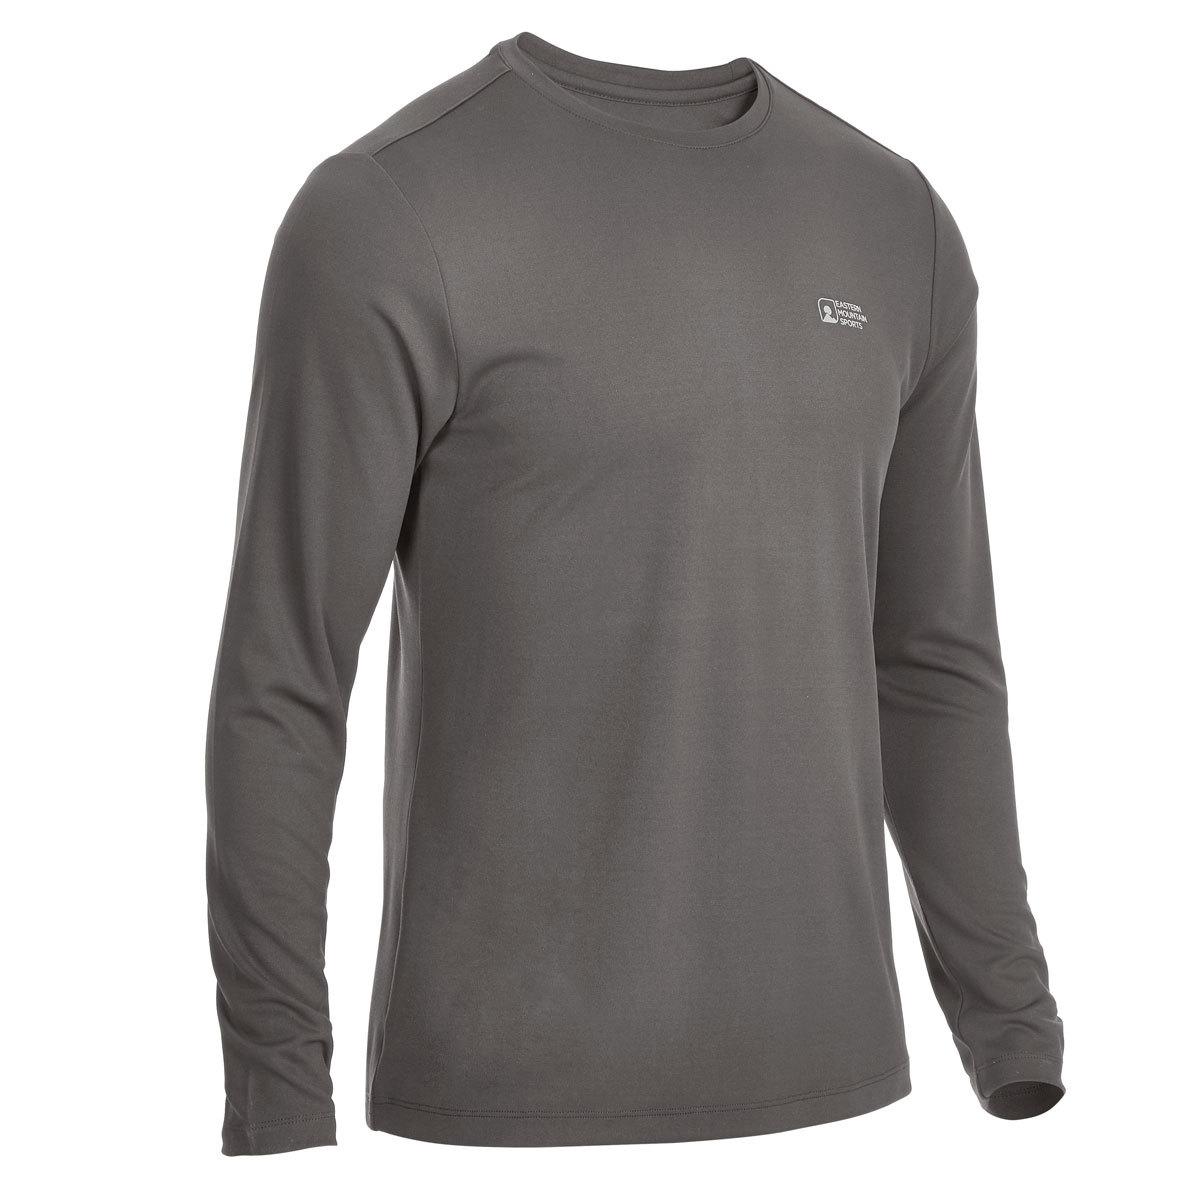 Ems Men's Epic Active Long-Sleeve Shirt - Black, S